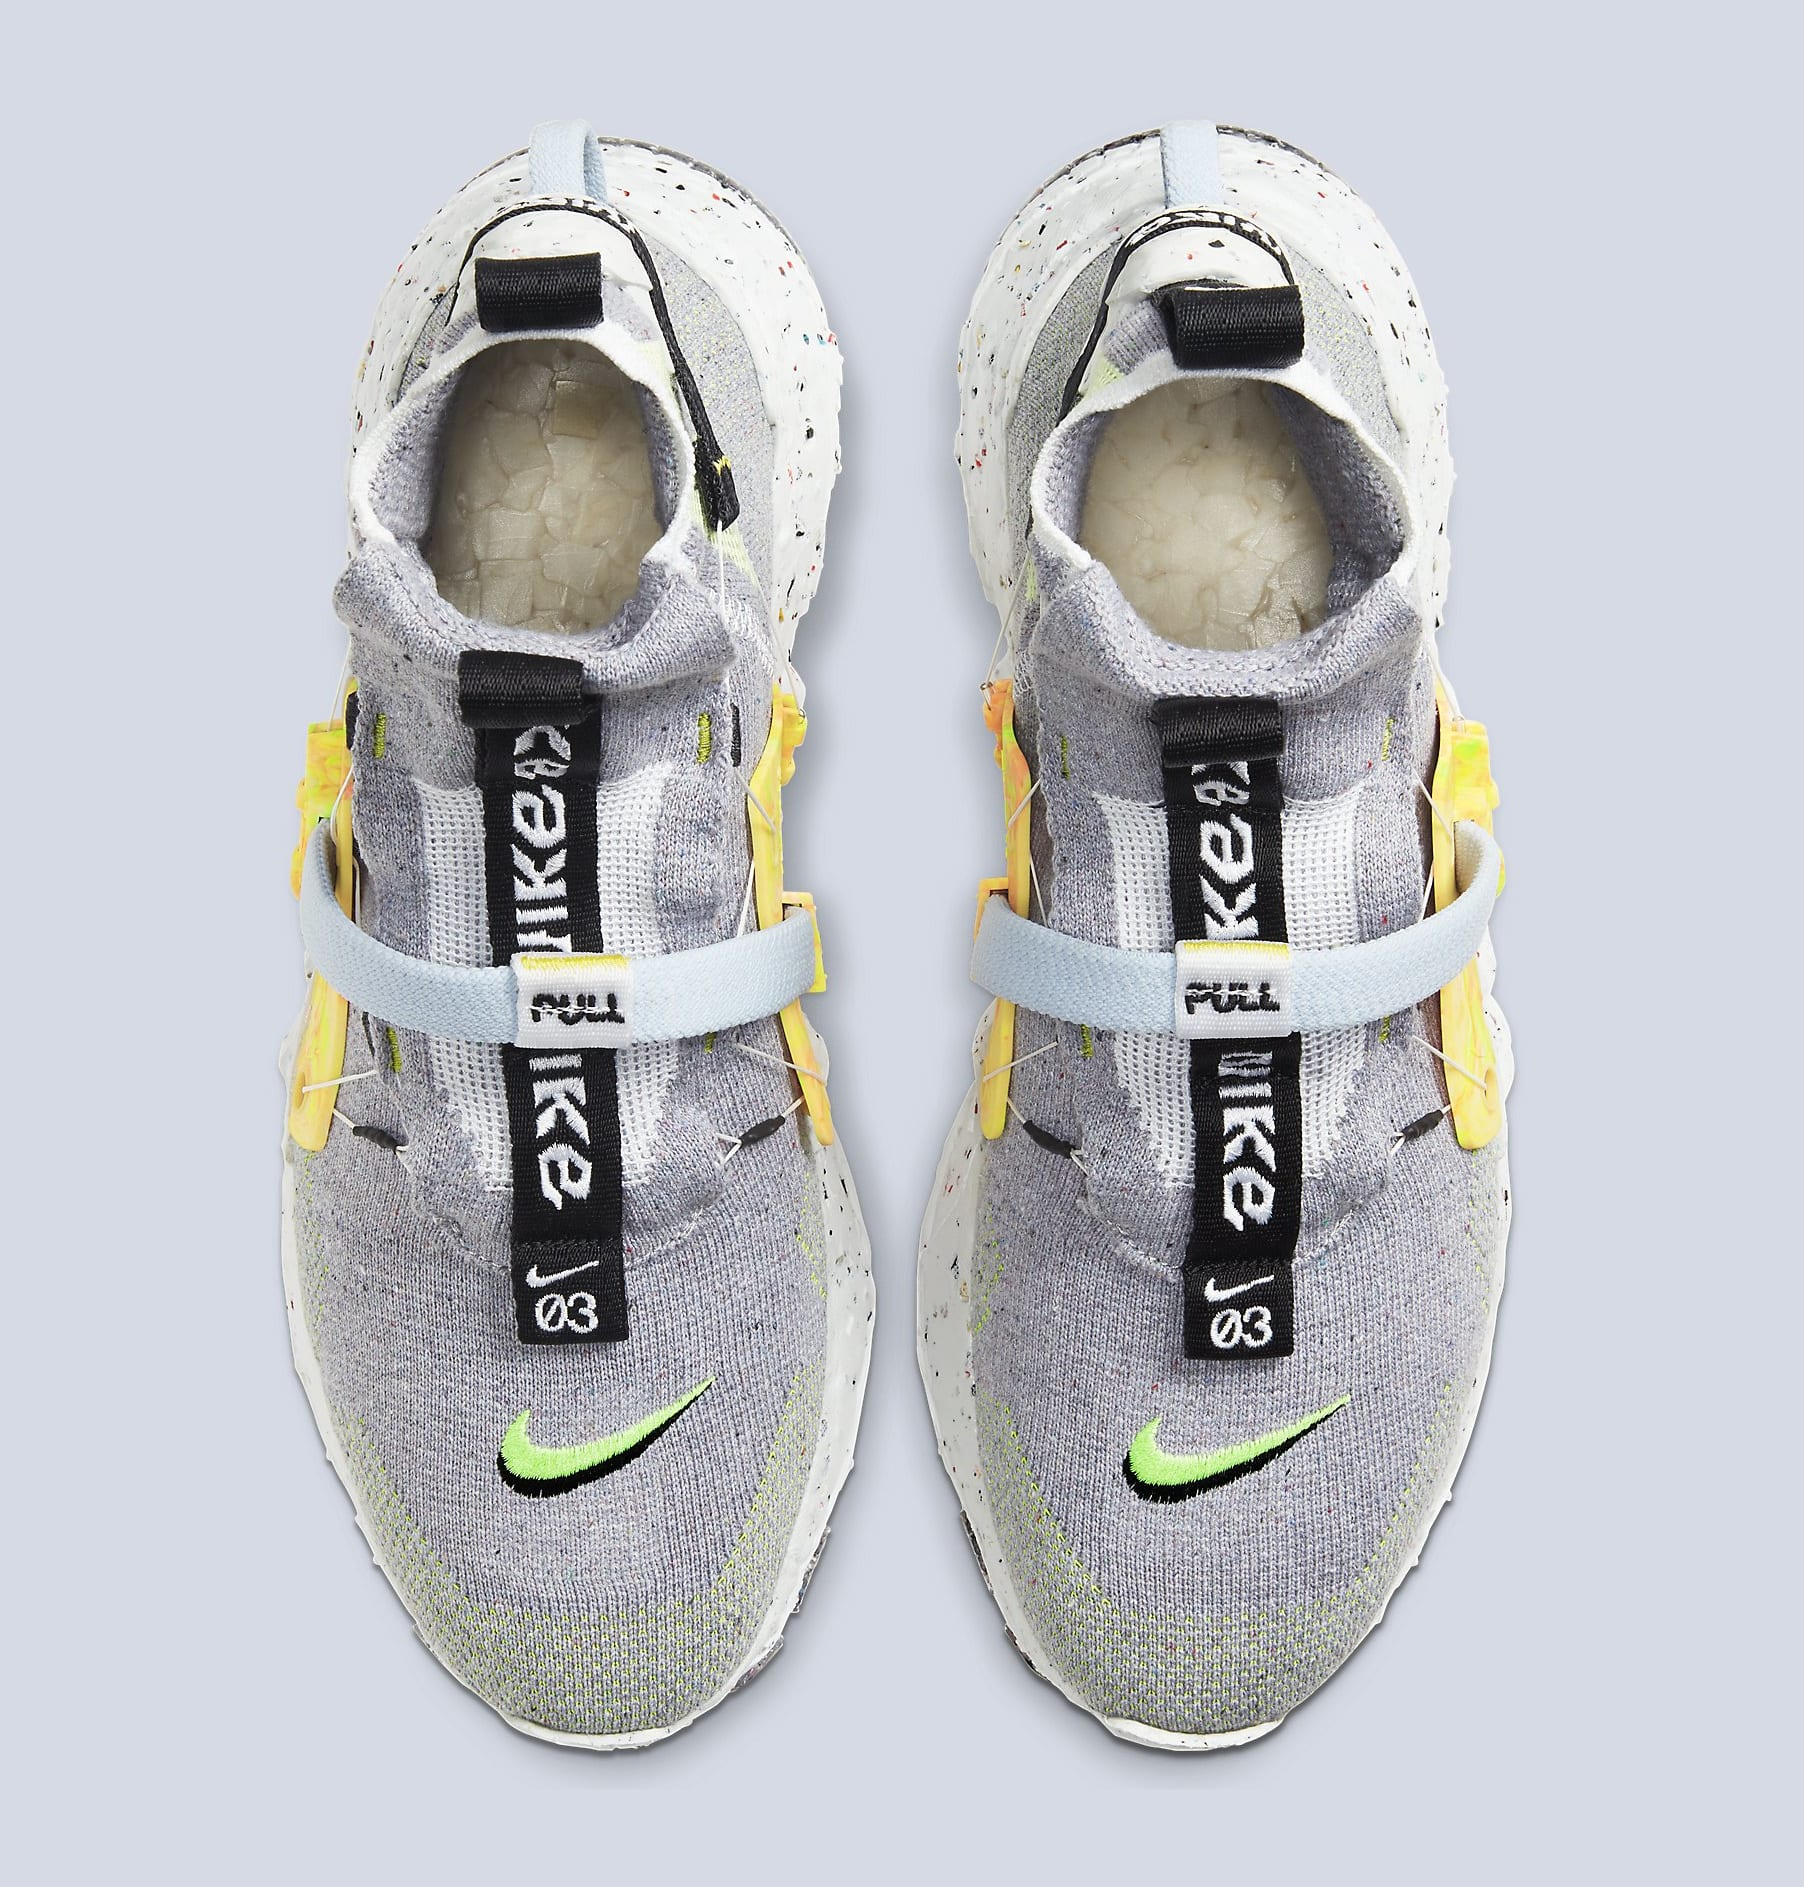 Nike Space Hippie 03 'Grey/Volt' CQ3989-002 Top